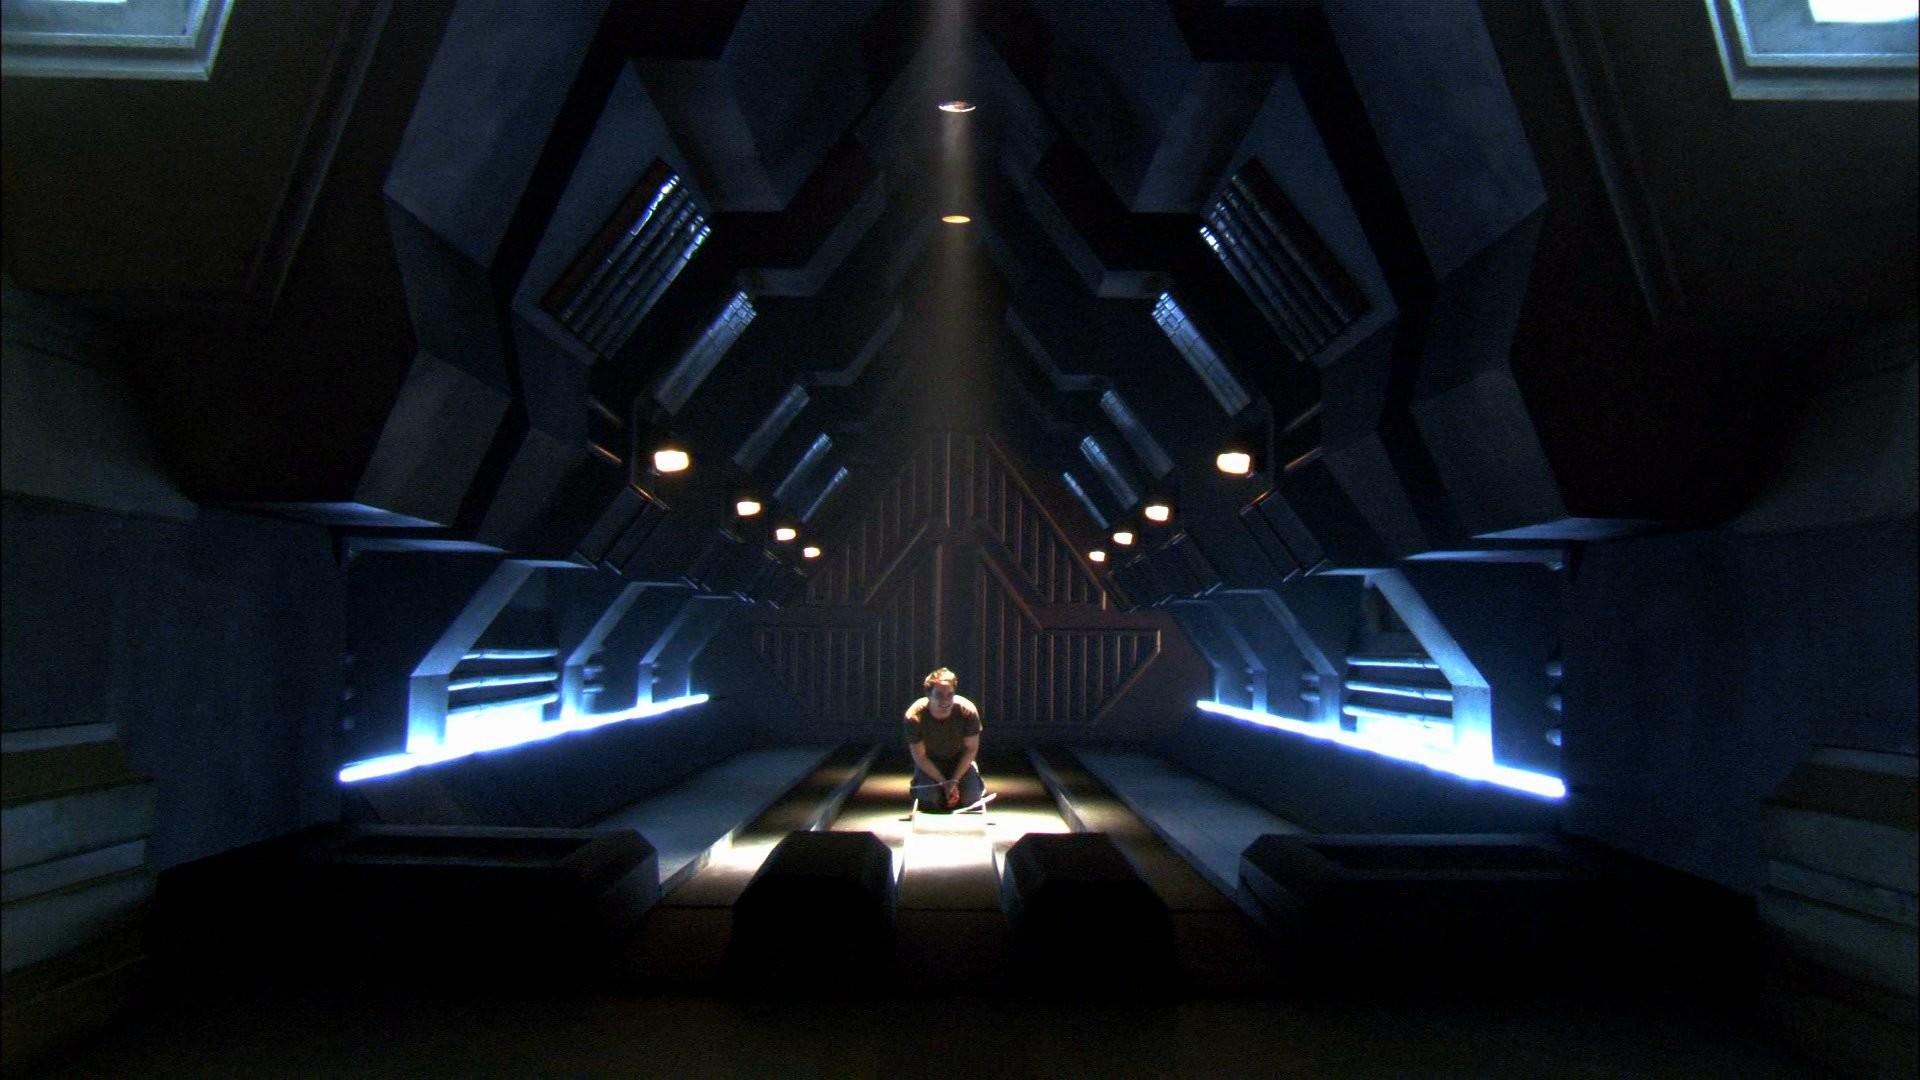 BATTLESTAR GALACTICA action adventure drama sci-fi wallpaper      264964   WallpaperUP